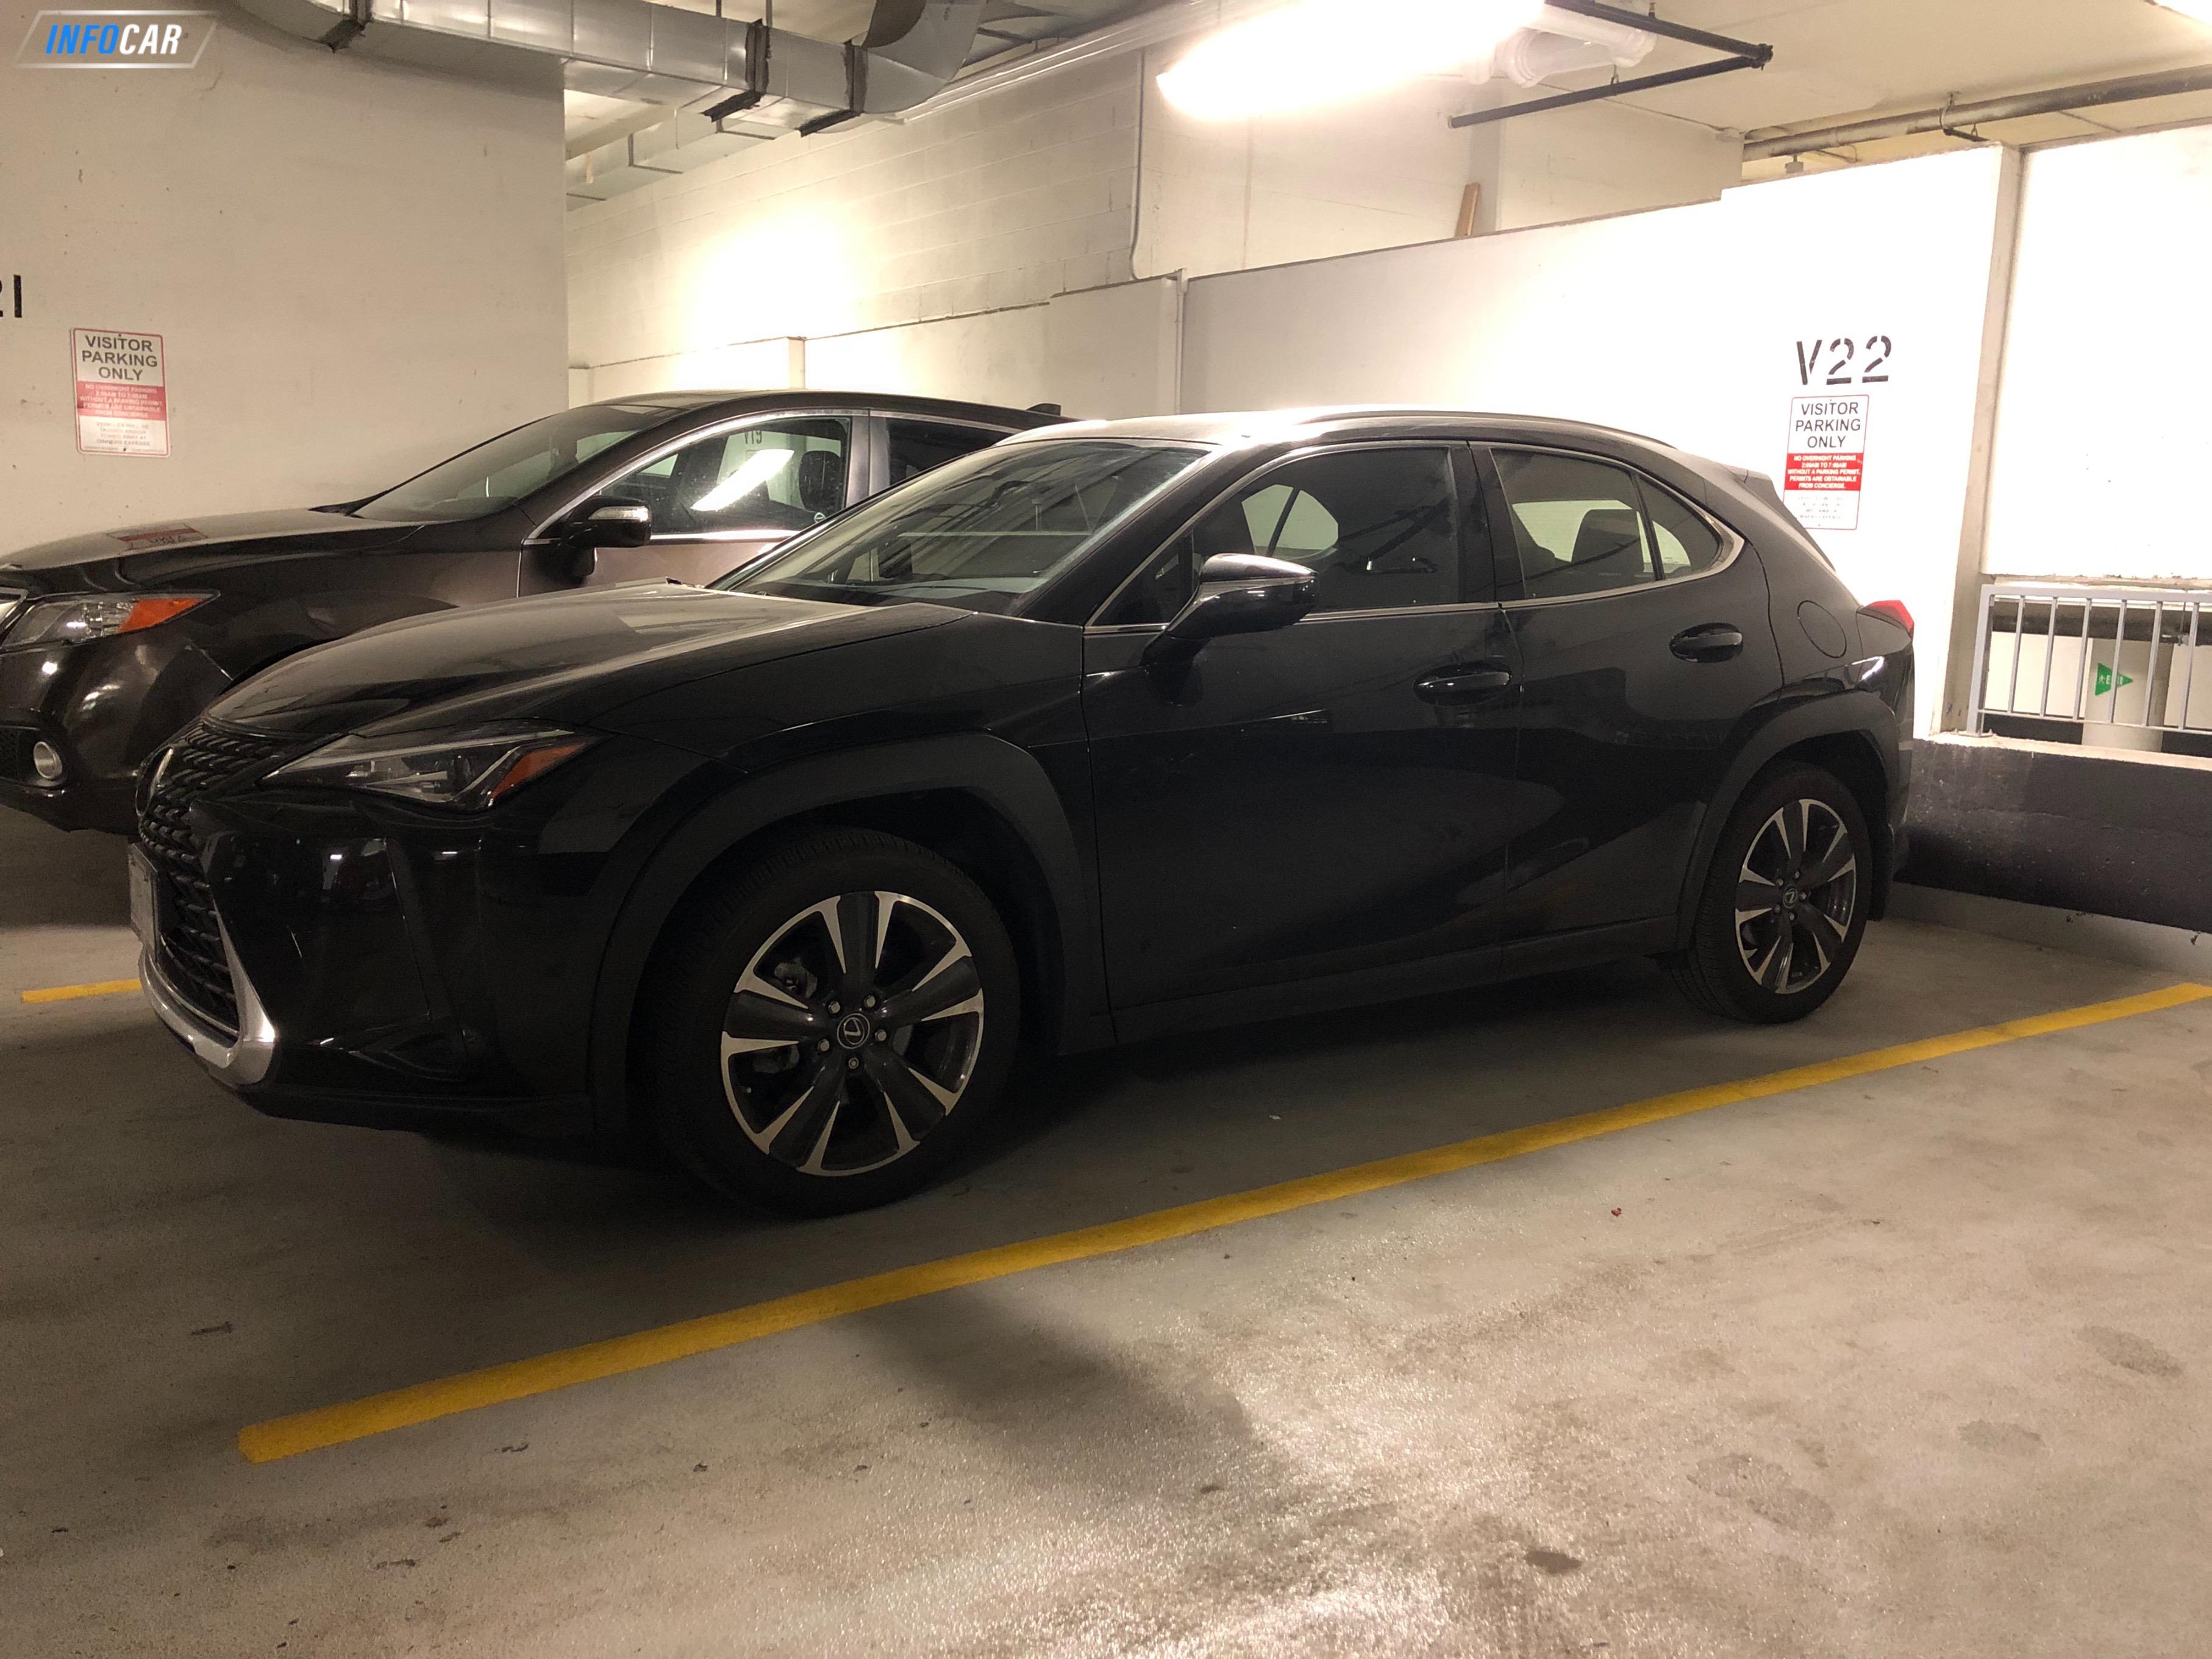 2019 Lexus UX 250h  - INFOCAR - Toronto's Most Comprehensive New and Used Auto Trading Platform